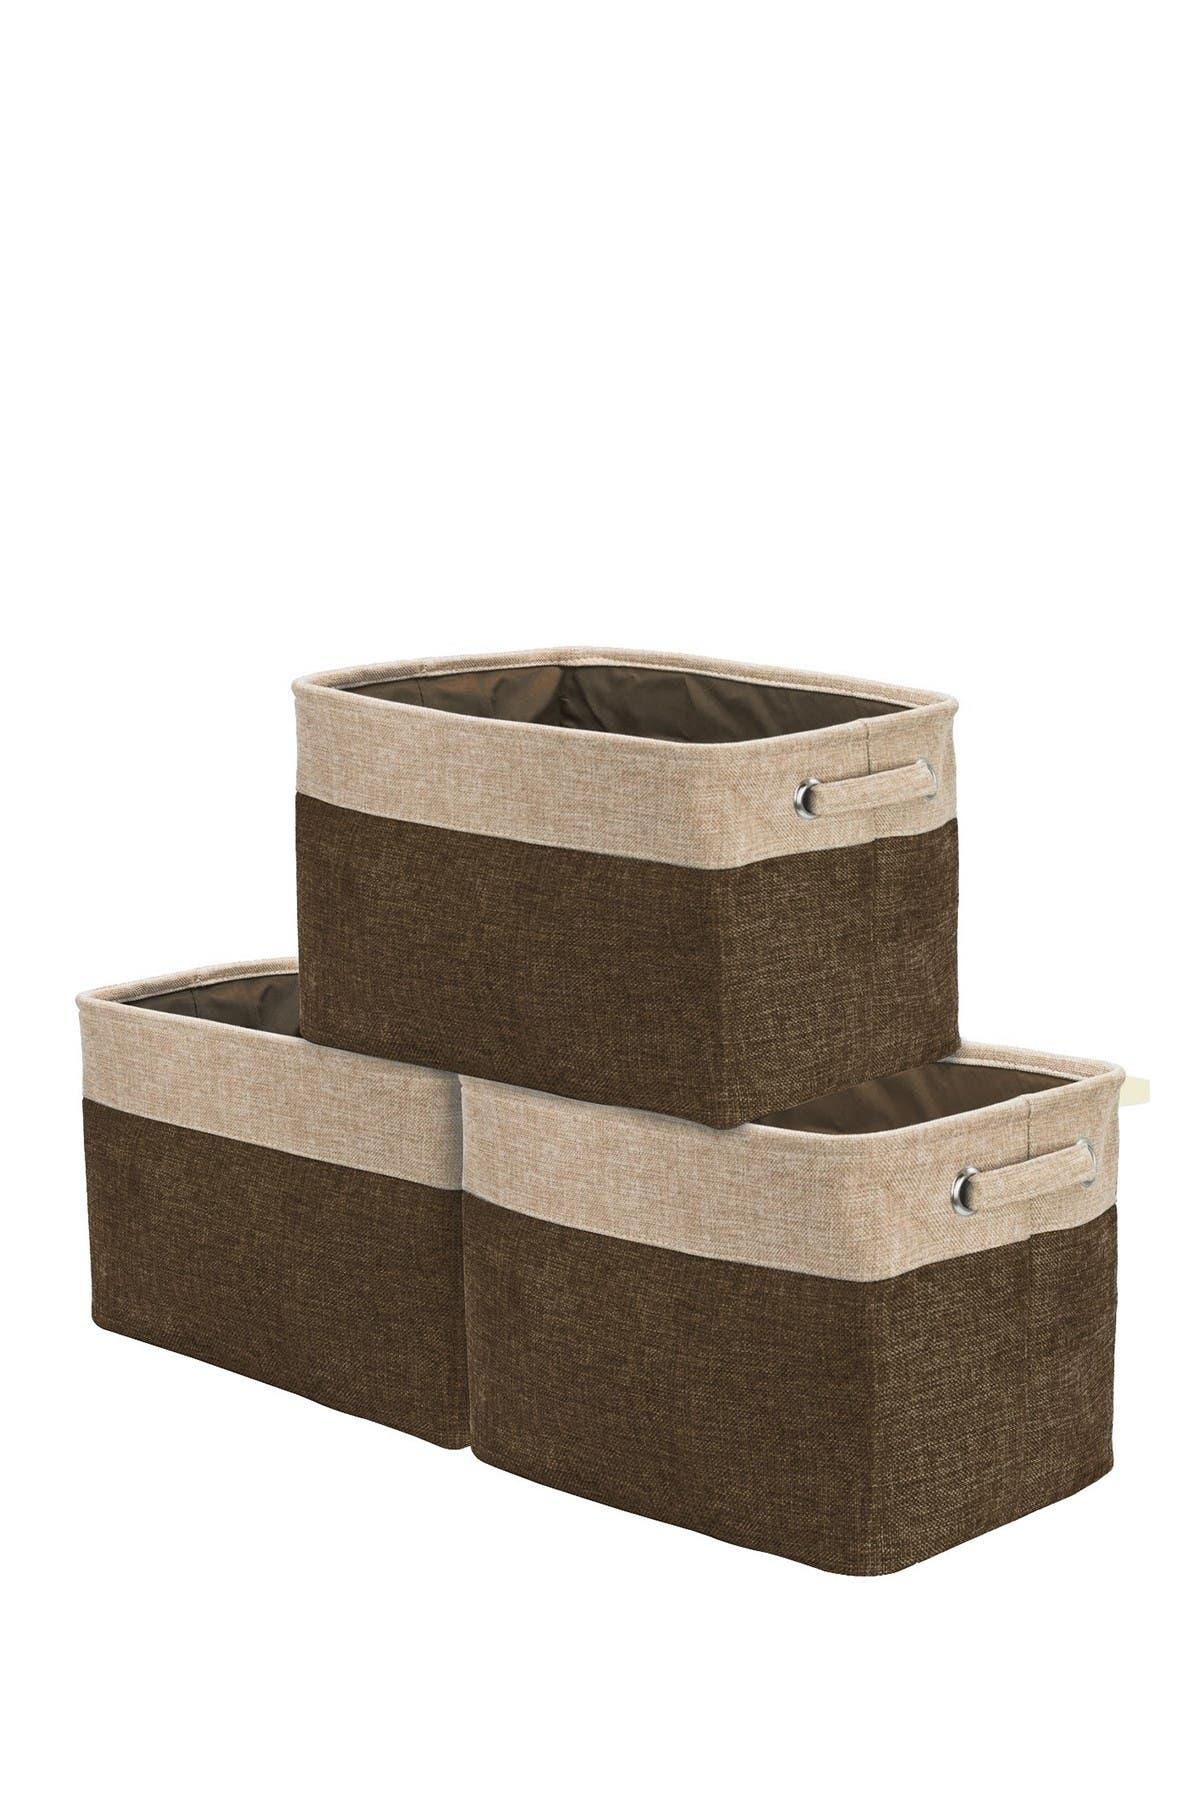 Image of Sorbus Brown Twill Storage Basket - Set of 3